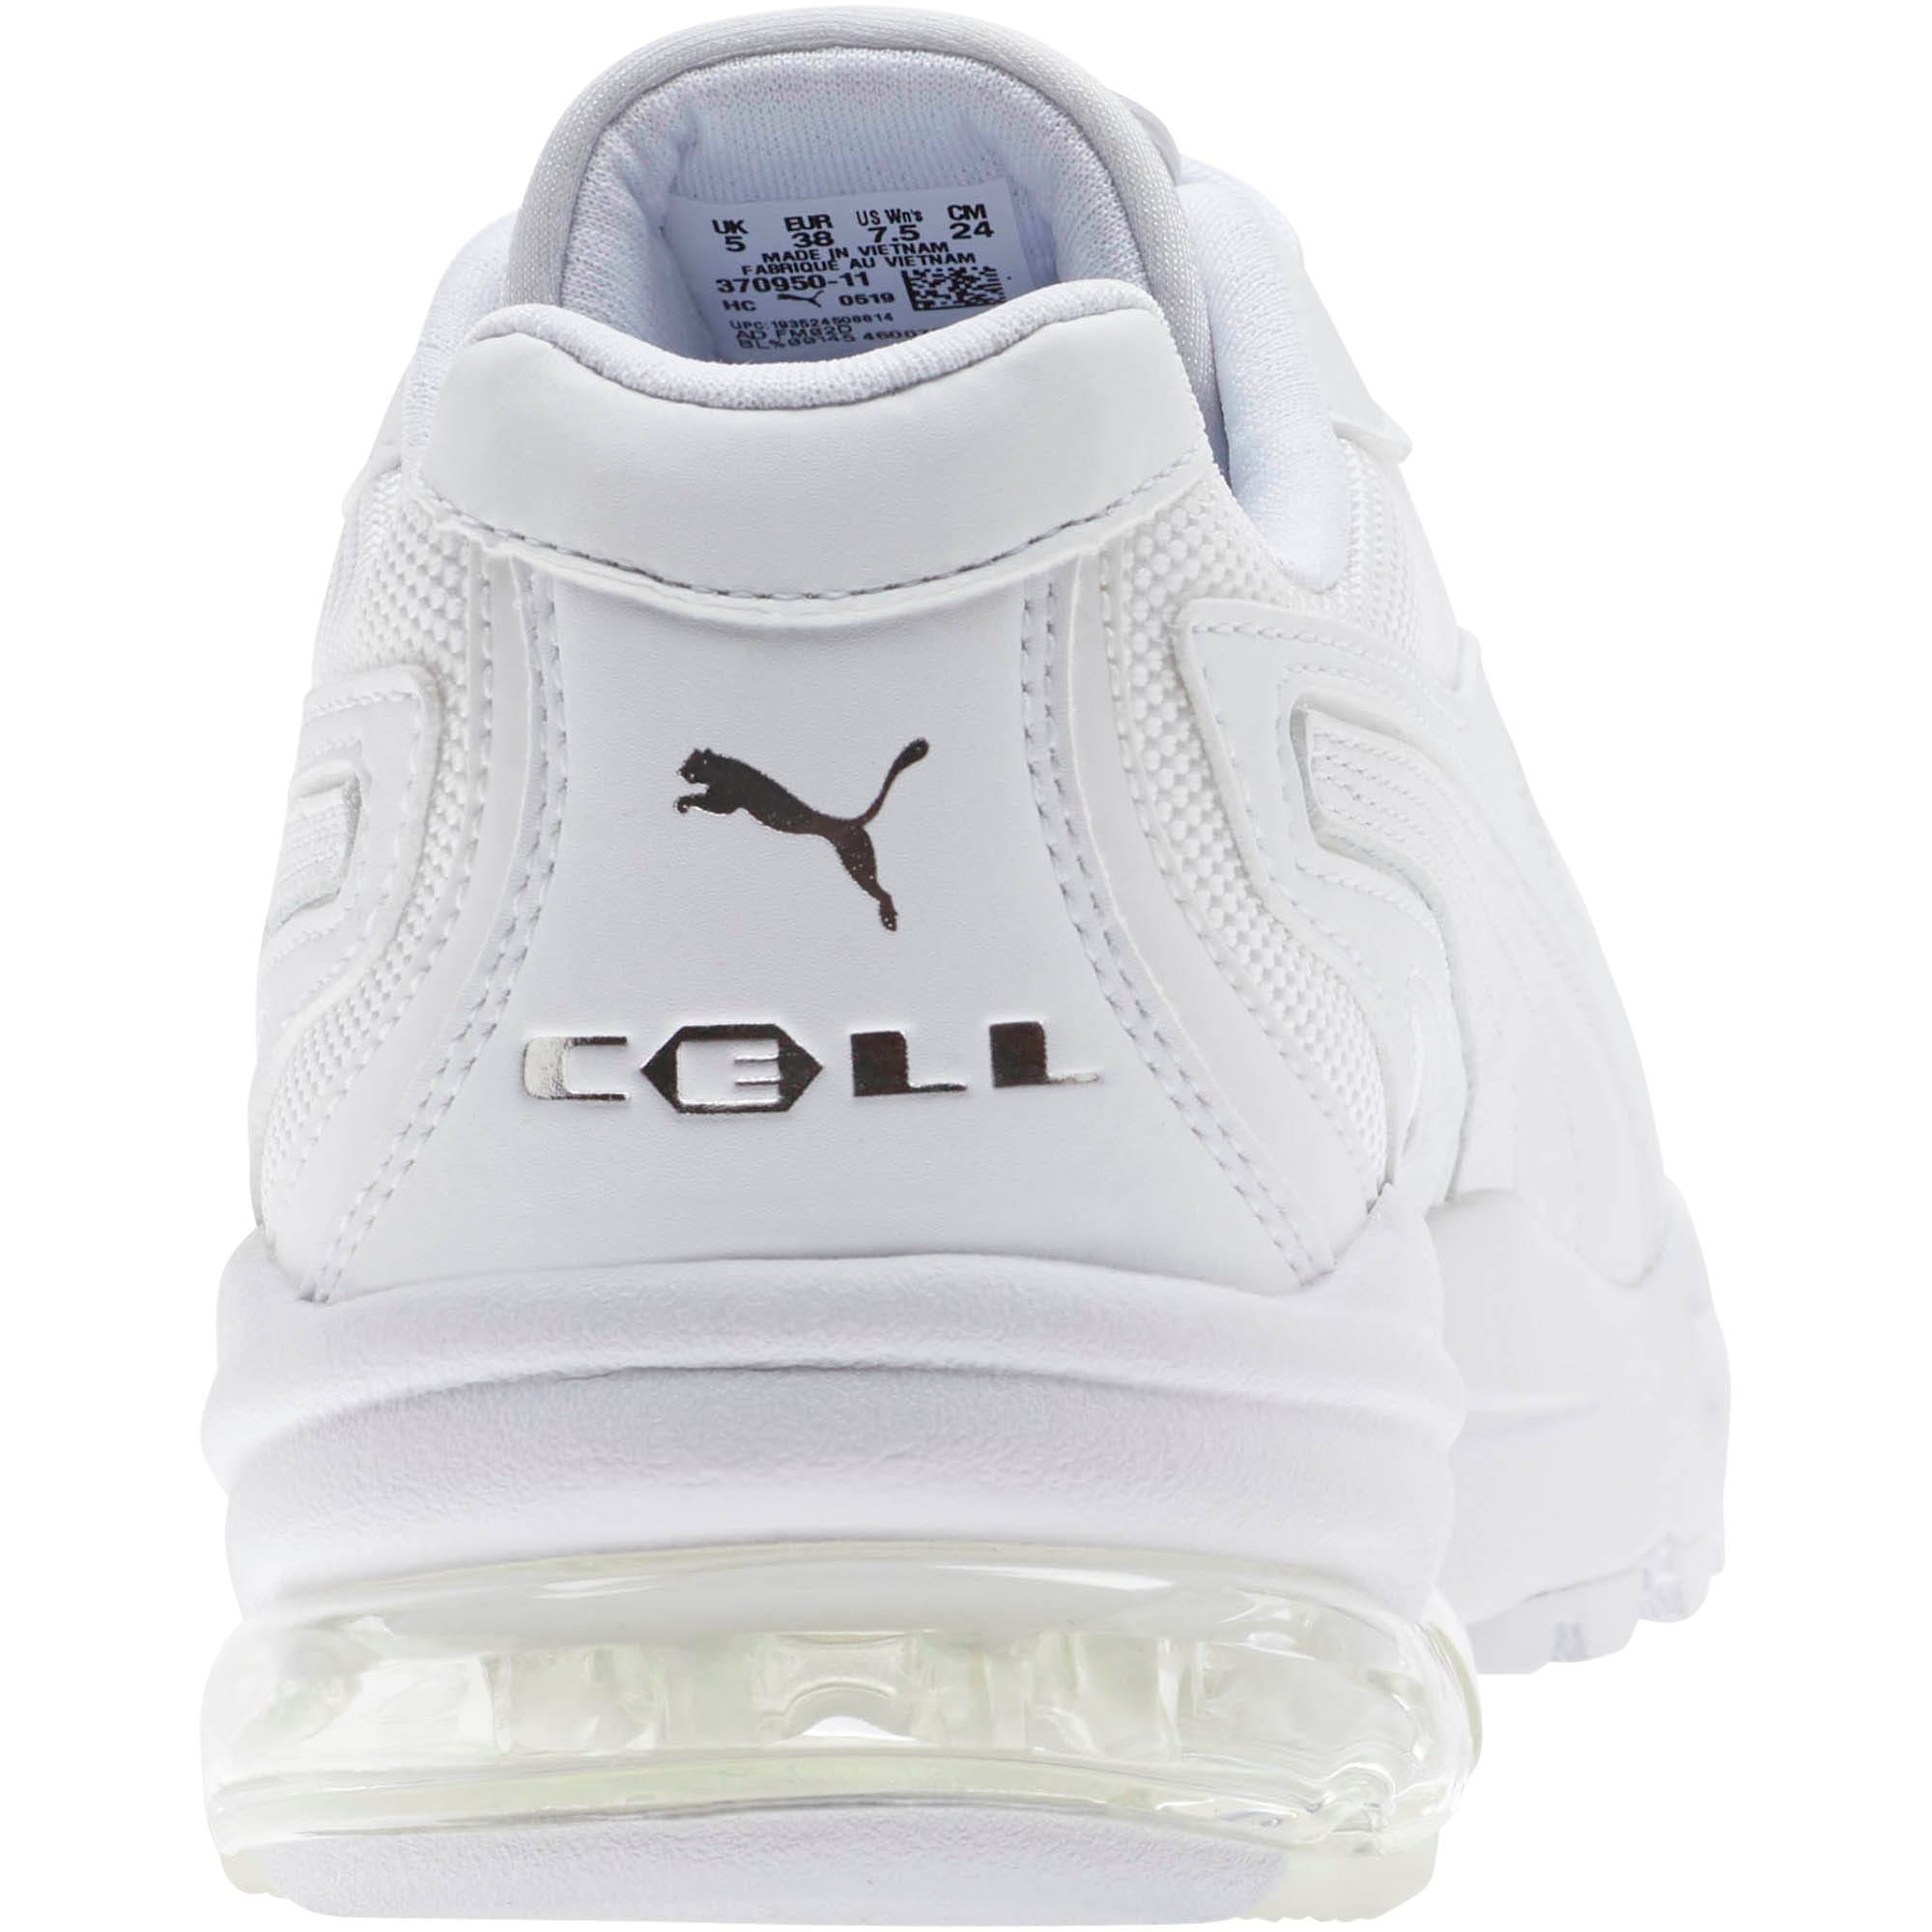 Thumbnail 3 of CELL Stellar Women's Sneakers, Puma White-Silver, medium